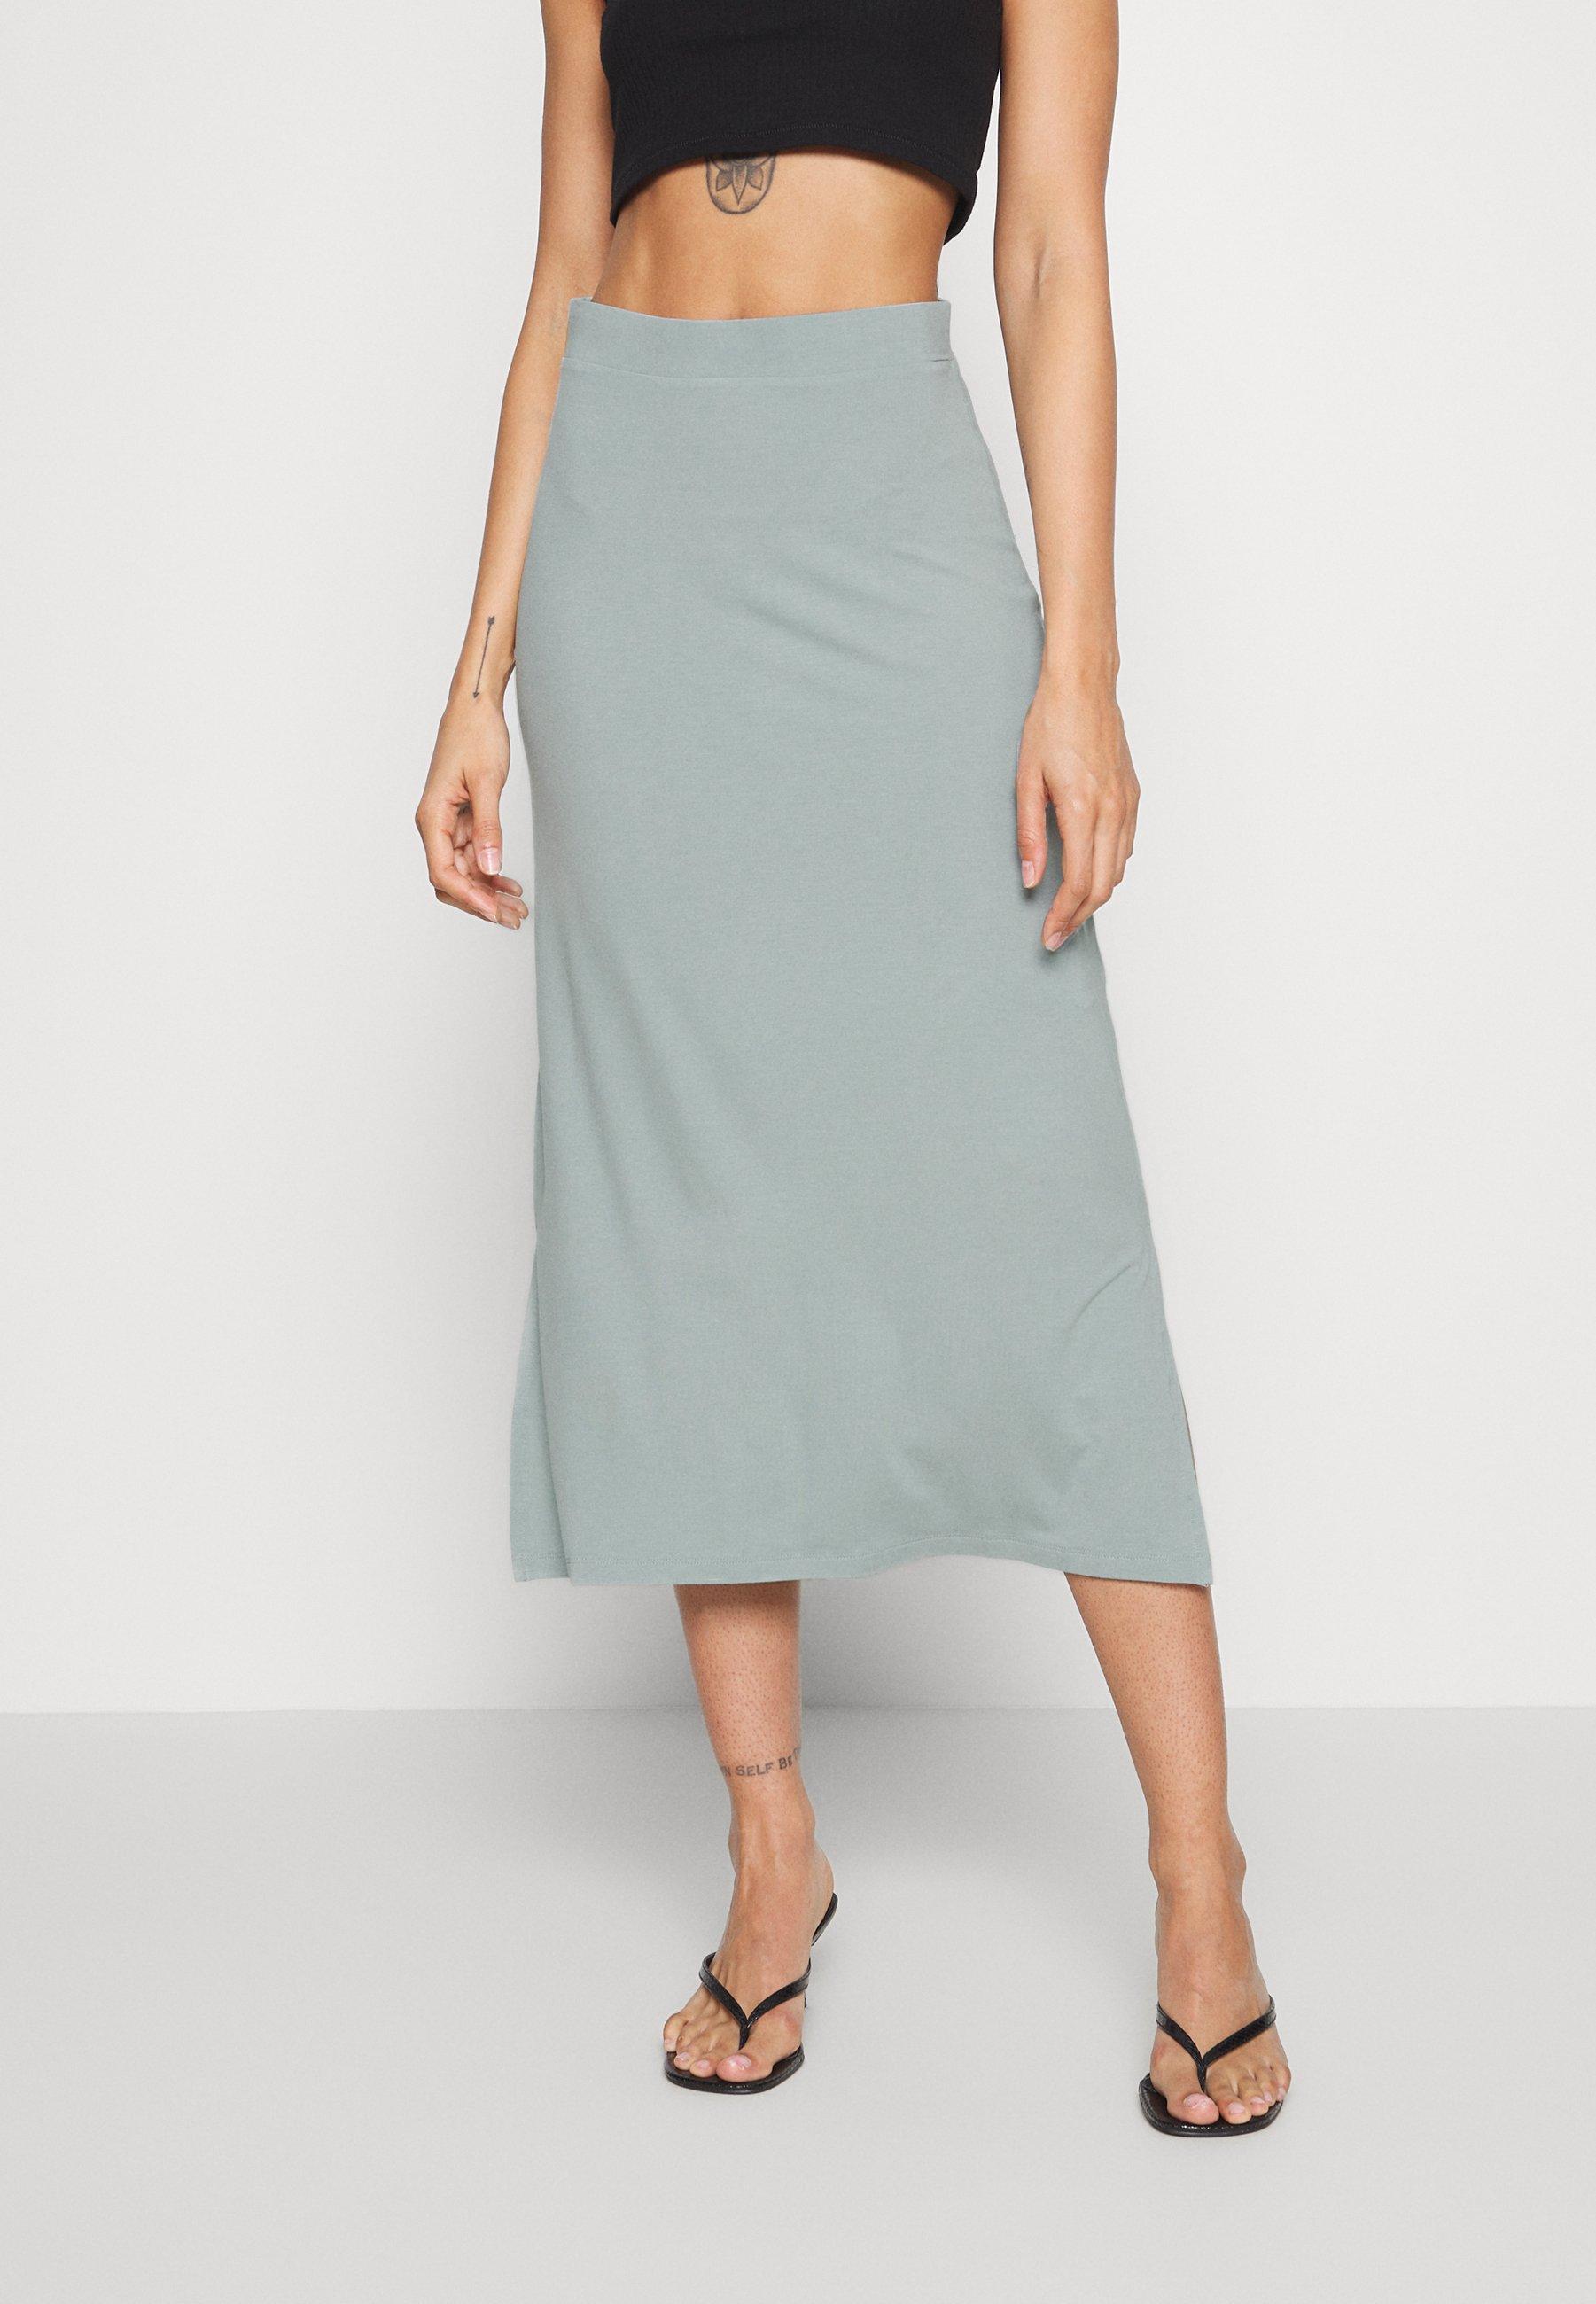 Even Odd Basic Maxi Skirt Jupe Longue Abyss Vert Clair Zalando Be